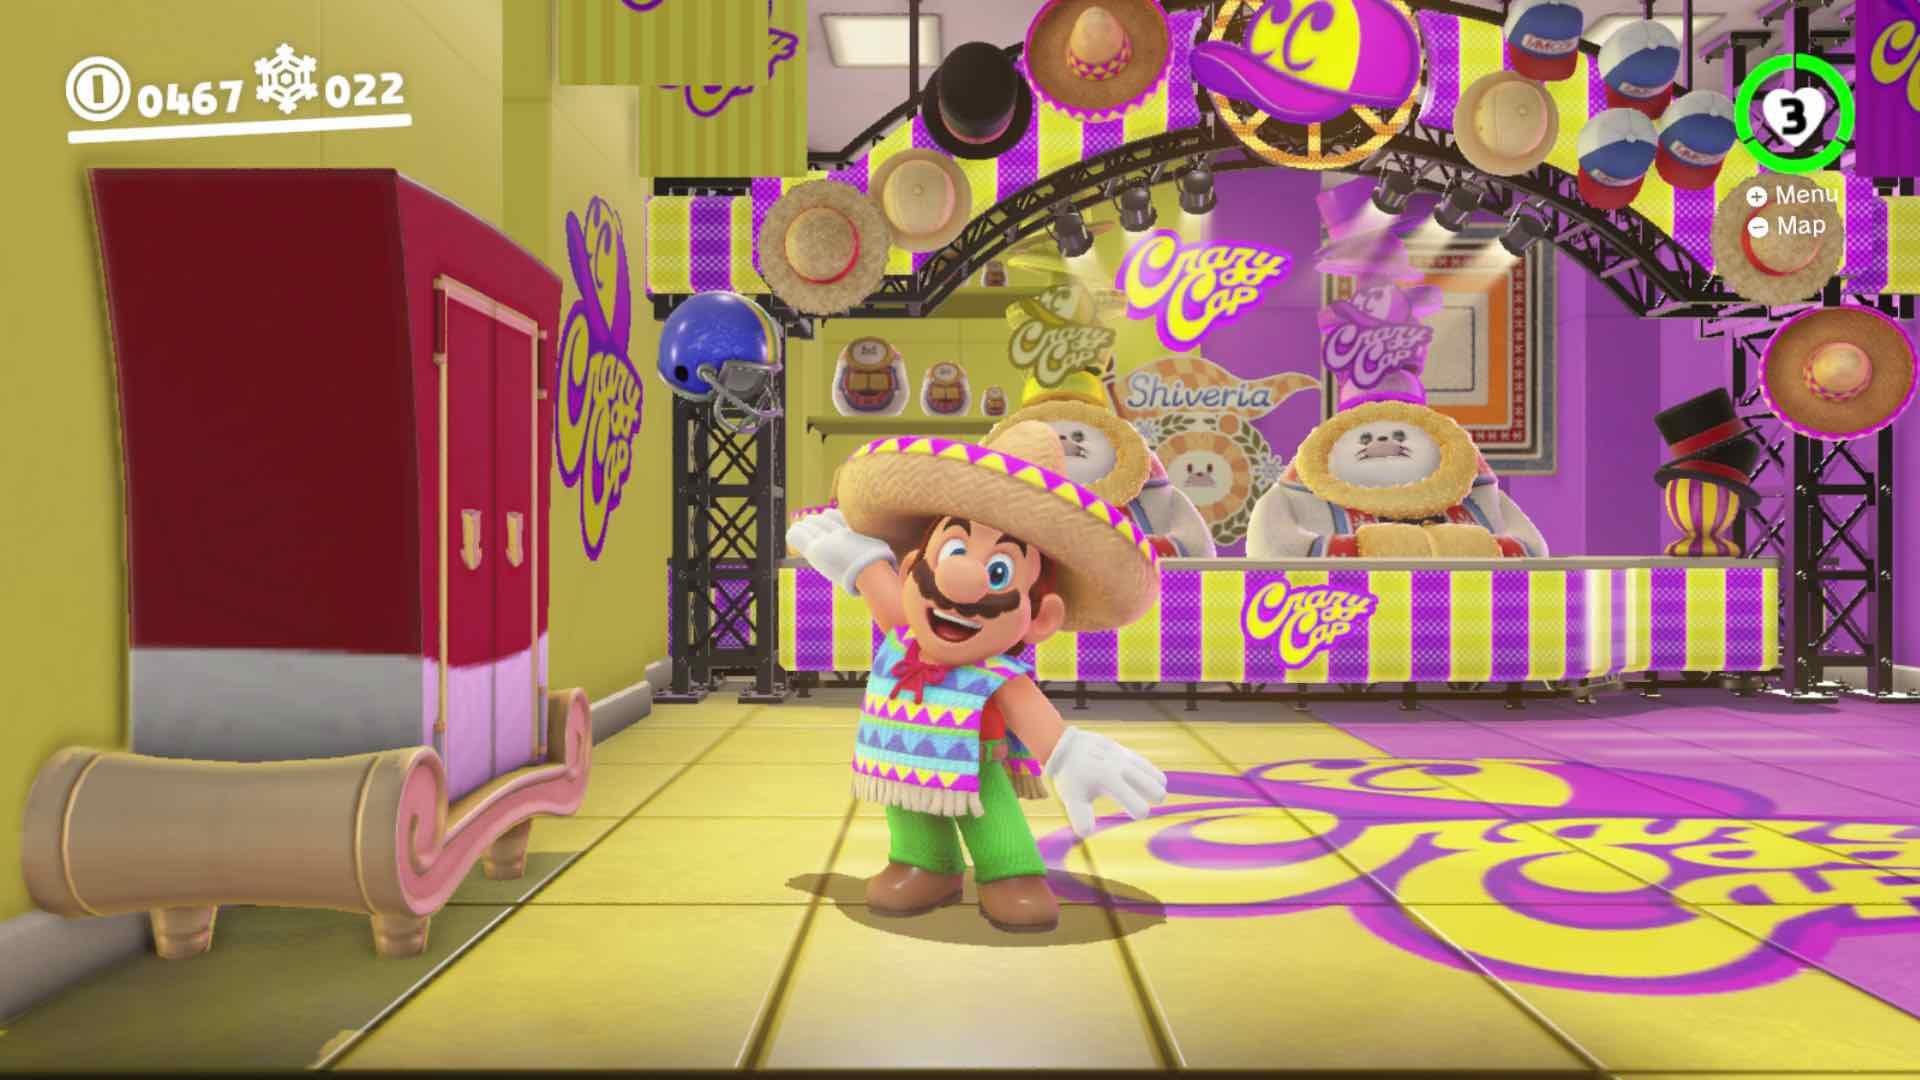 poncho-super-mario-odyssey-screenshot